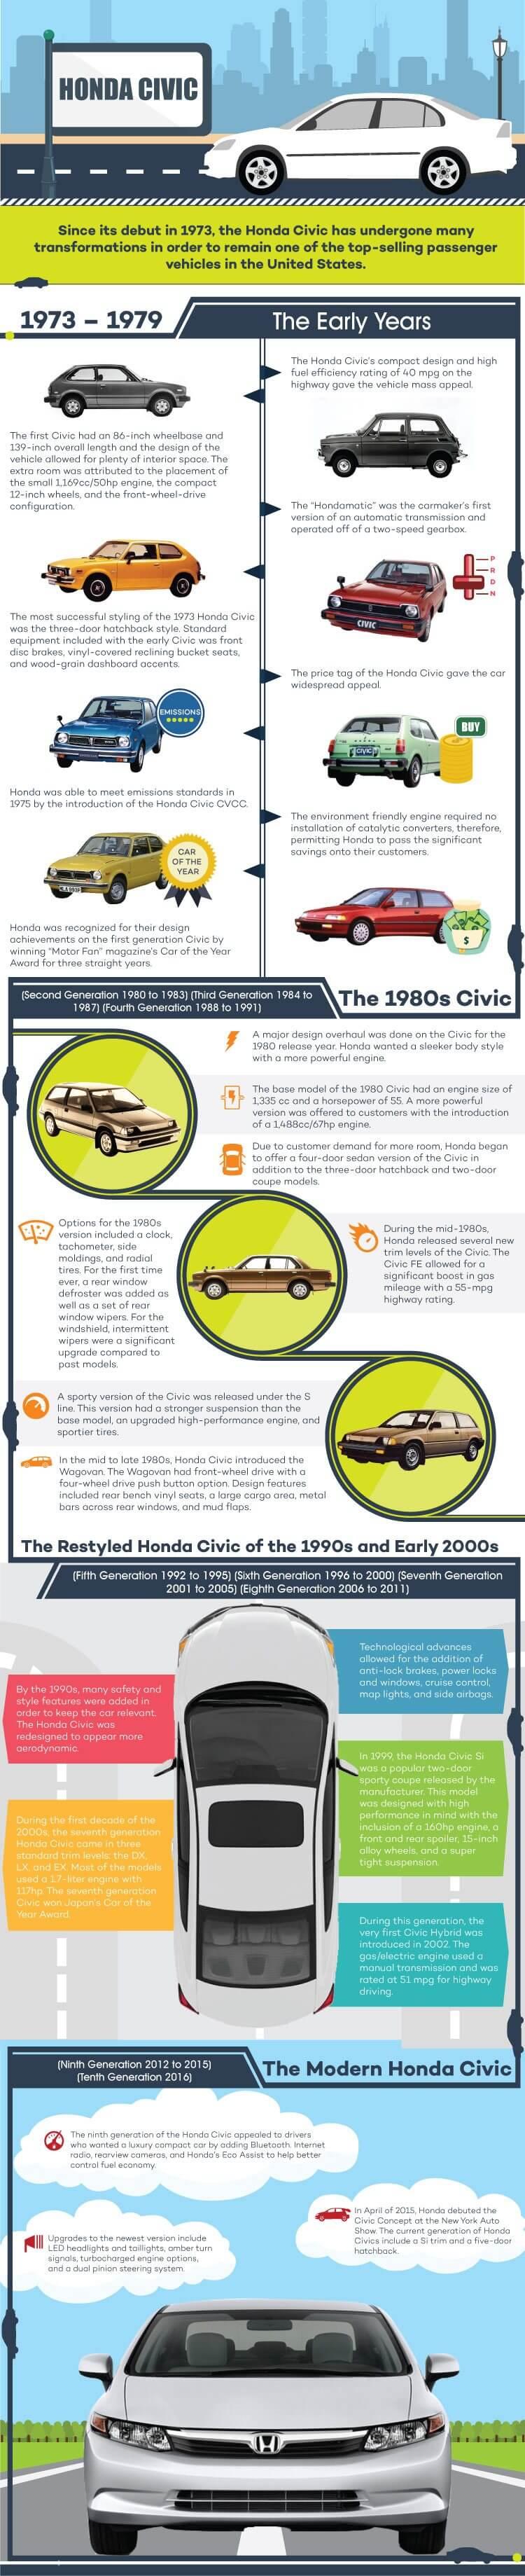 History of the Honda Civic